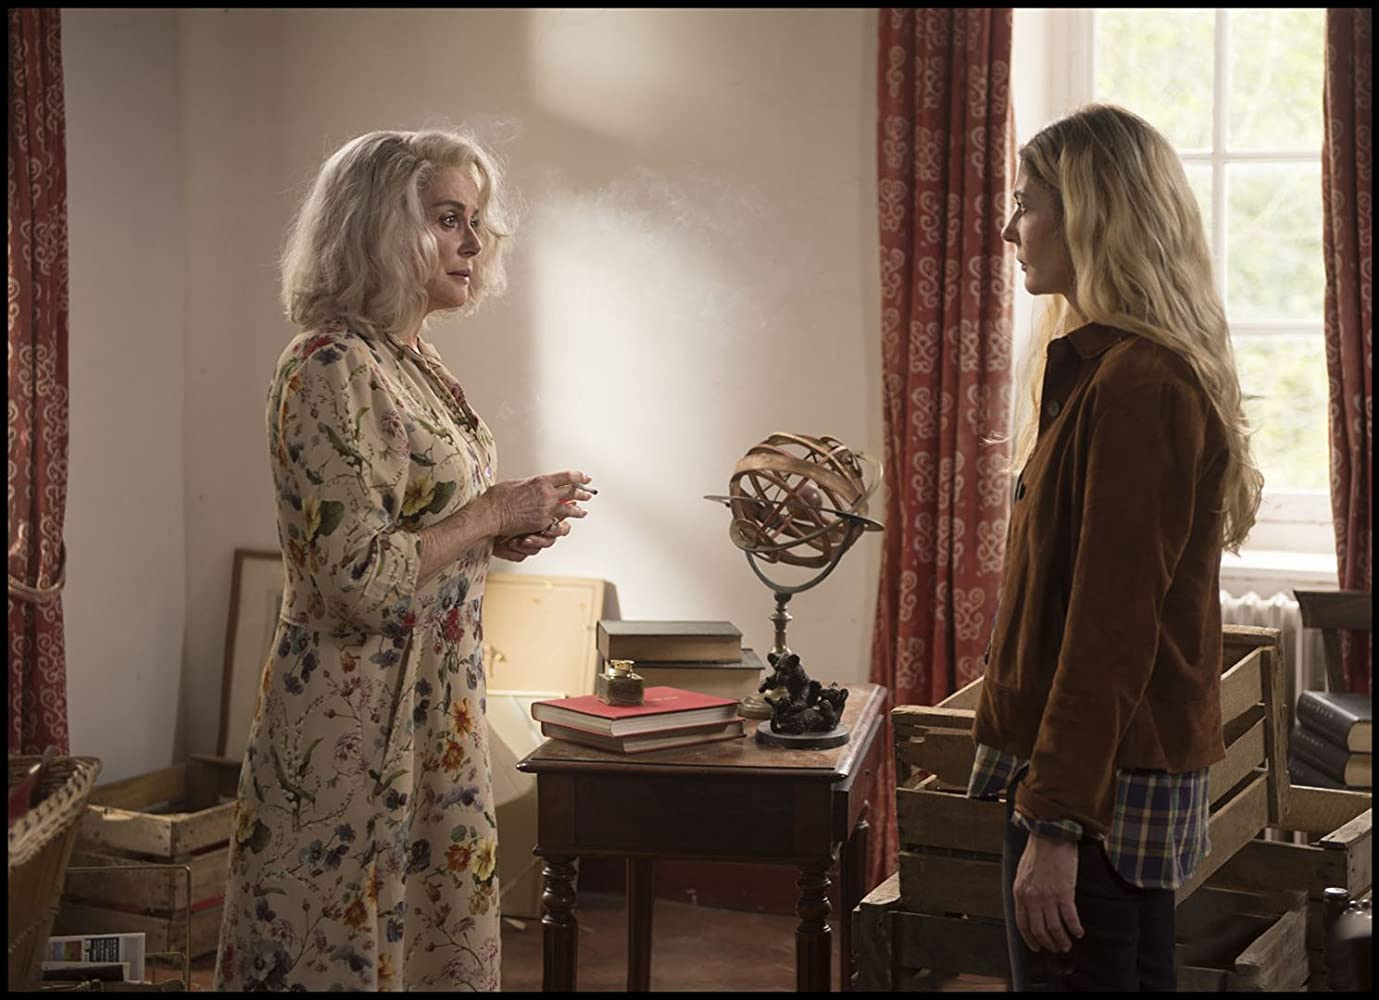 Catherine Deneuve and Chiara Mastroianni in La dernière folie de Claire Darling (2018)